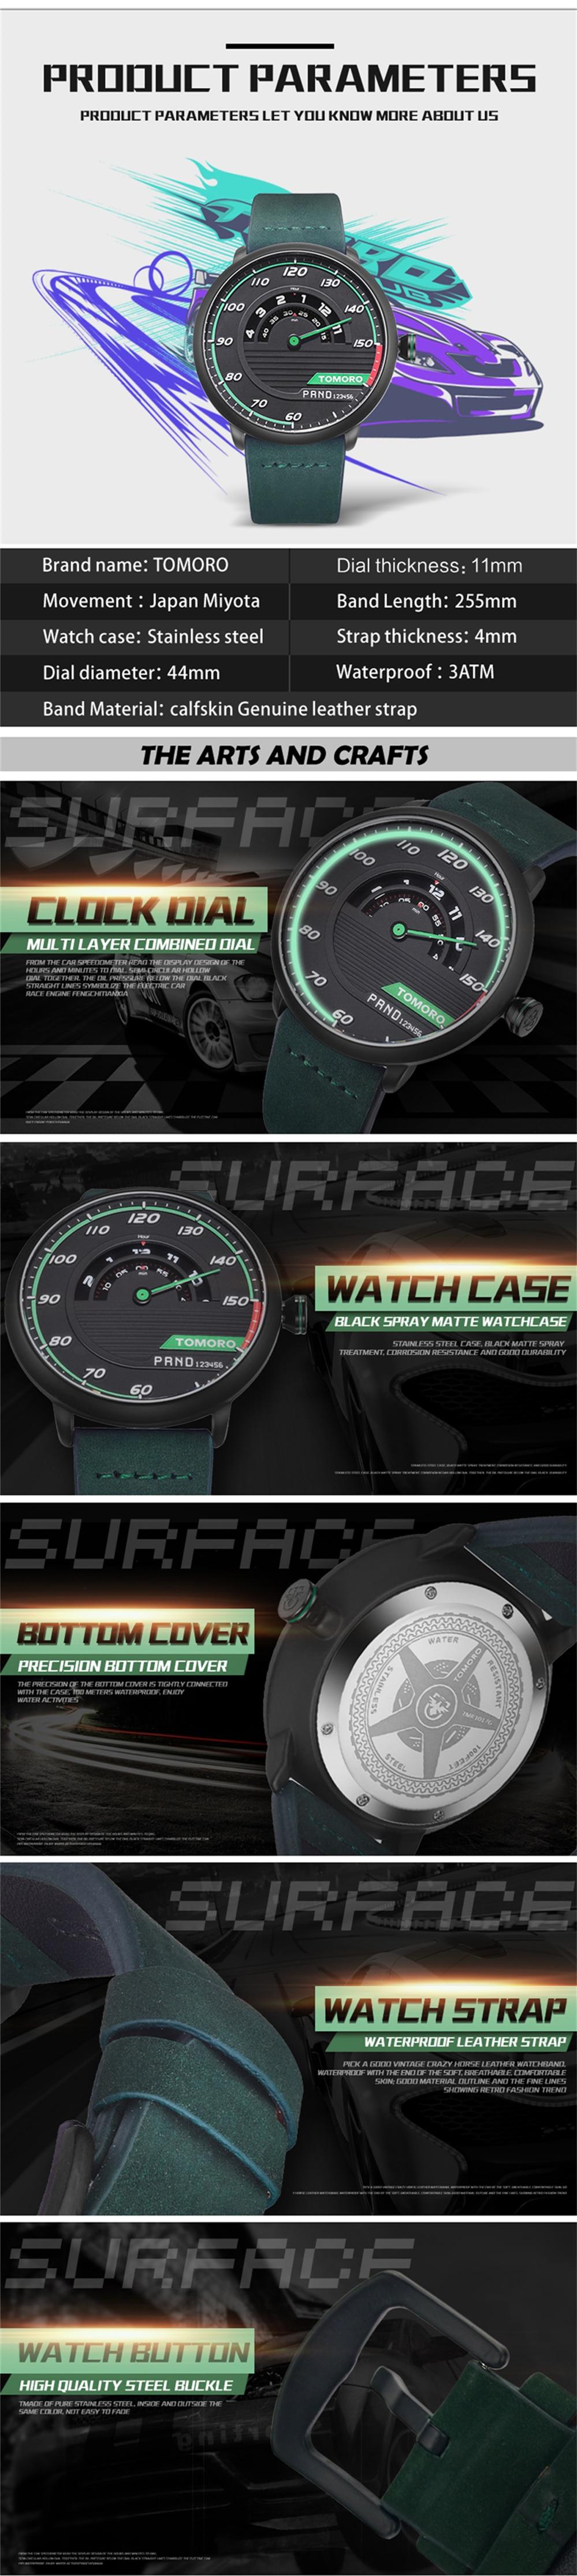 HTB1hp4fQVXXXXXnXVXXq6xXFXXXZ TOMORO Men's Unique Racing Car 3D Design Wrist Watch